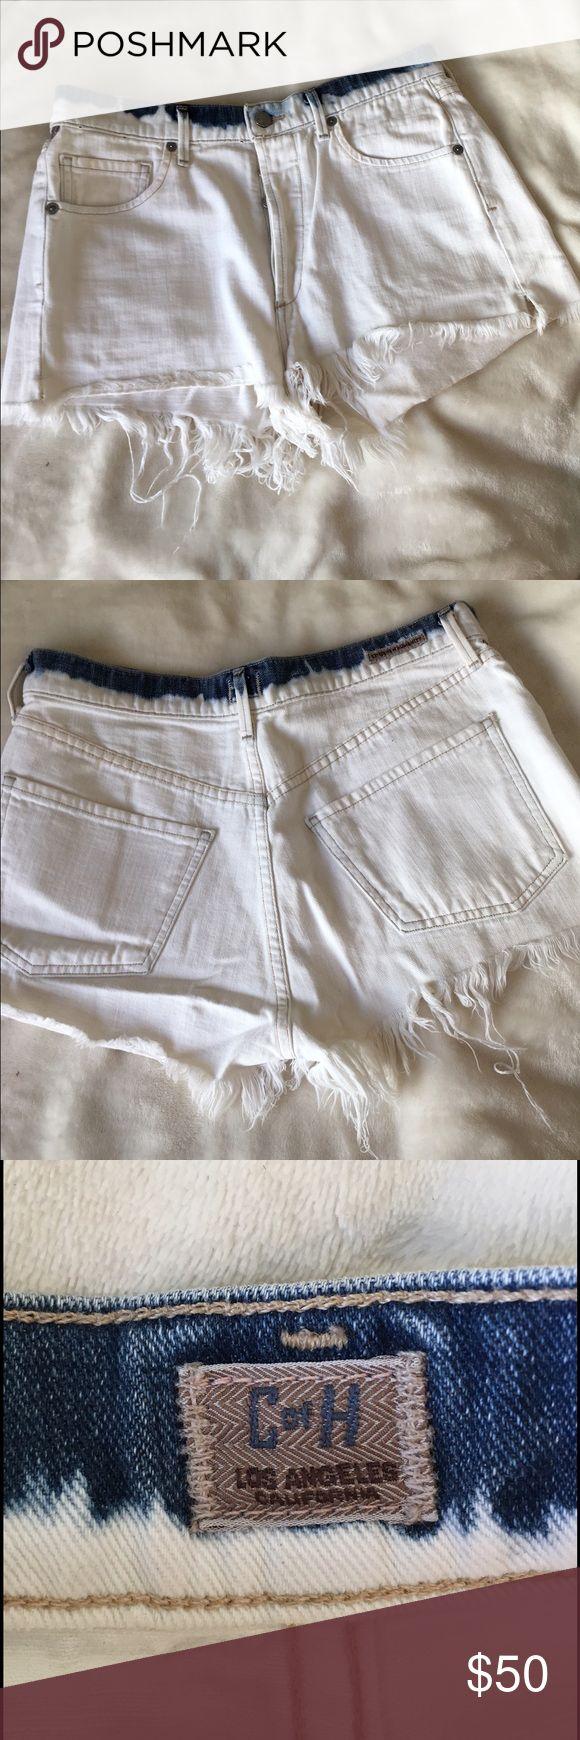 Citizens of Humanity denim cutoff jean shorts Citizens of Humanity denim cutoff shorts. White with denim around waist. Size 28 Citizens of Humanity Shorts Jean Shorts